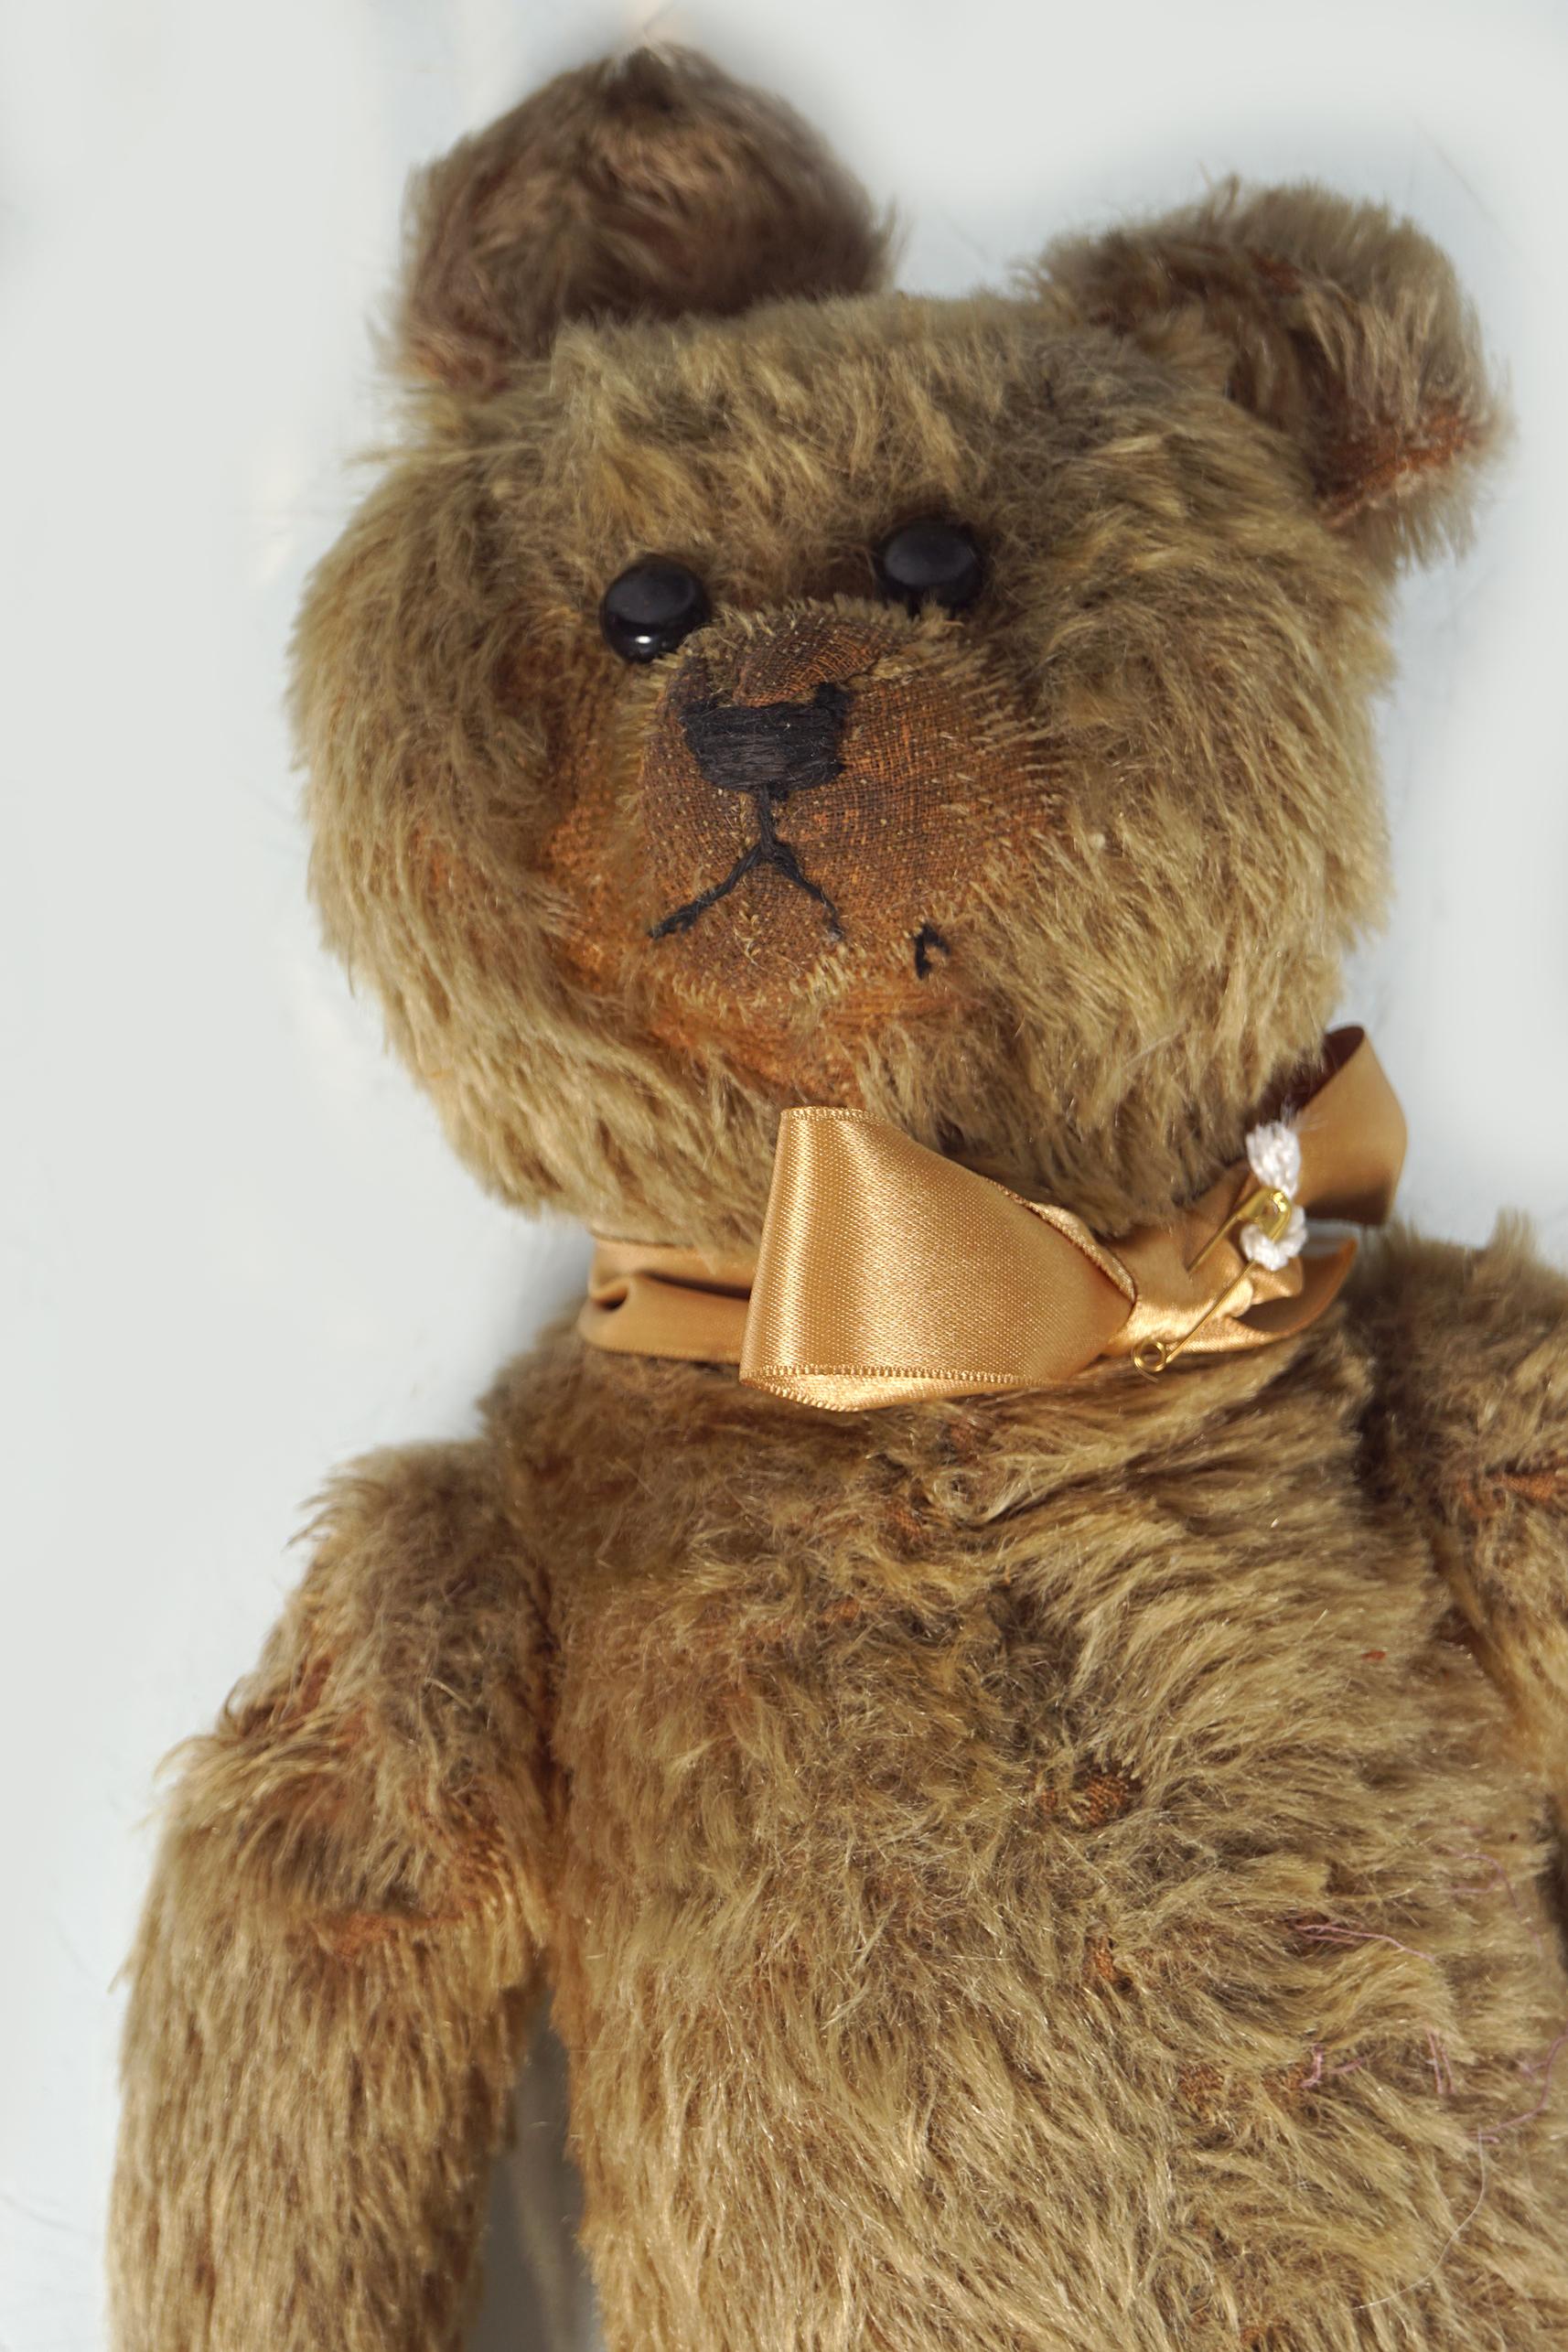 EARLY 20TH-CENTURY TEDDY BEAR - Image 2 of 2